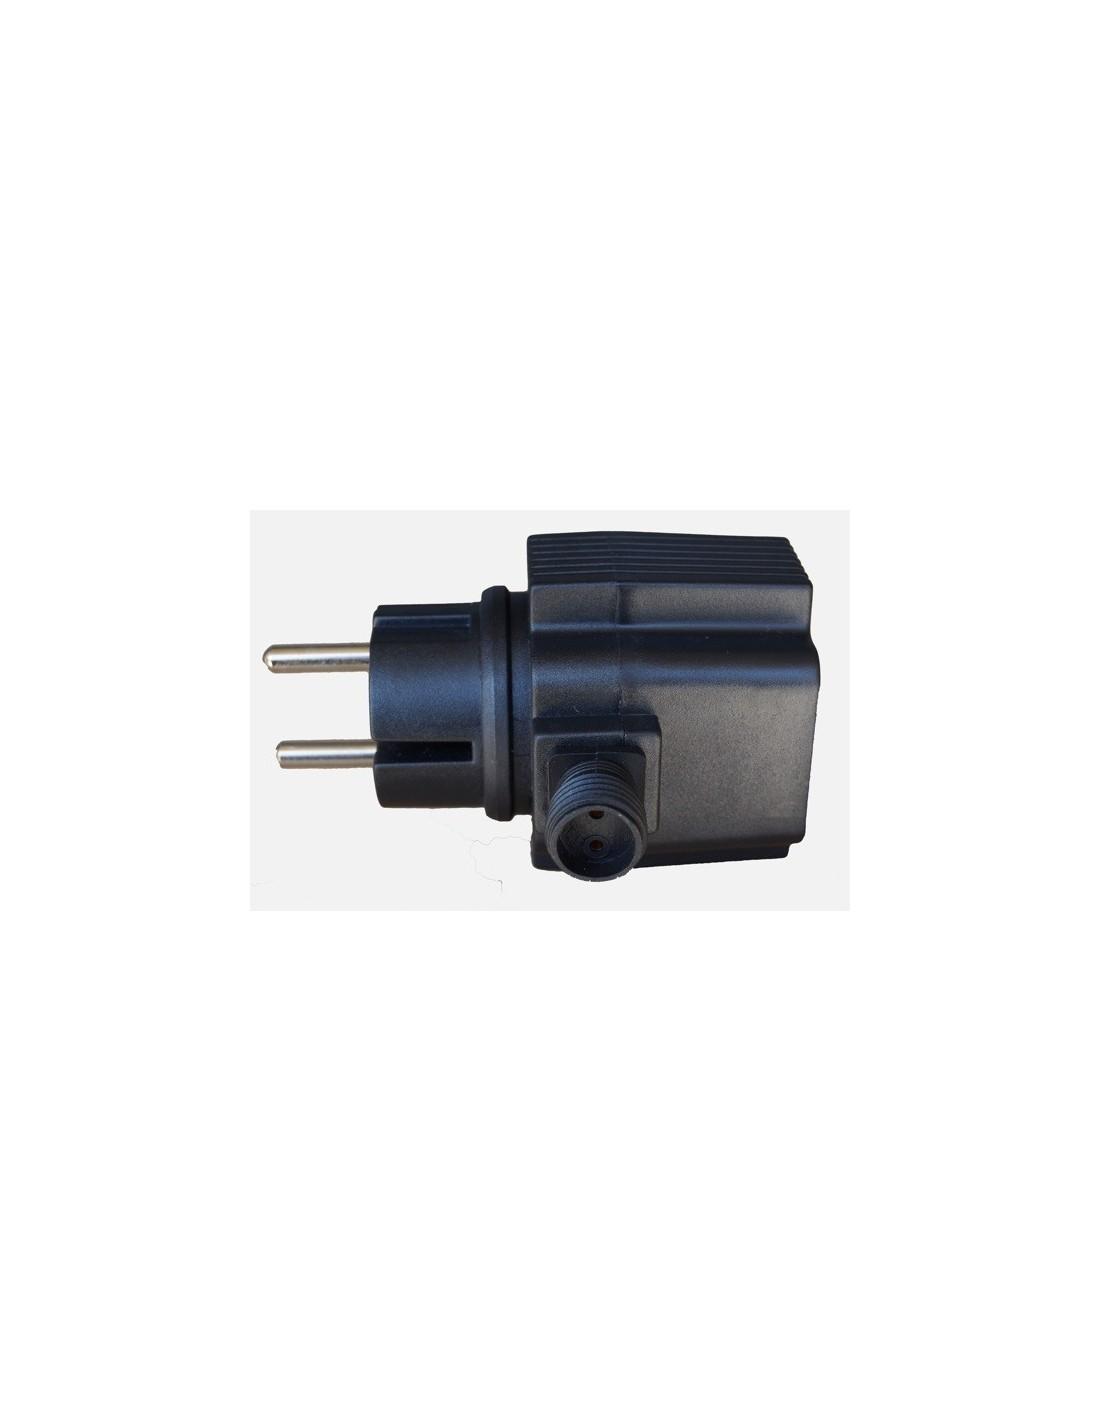 Transformador 20w 230 12v for Accesorios para estanques